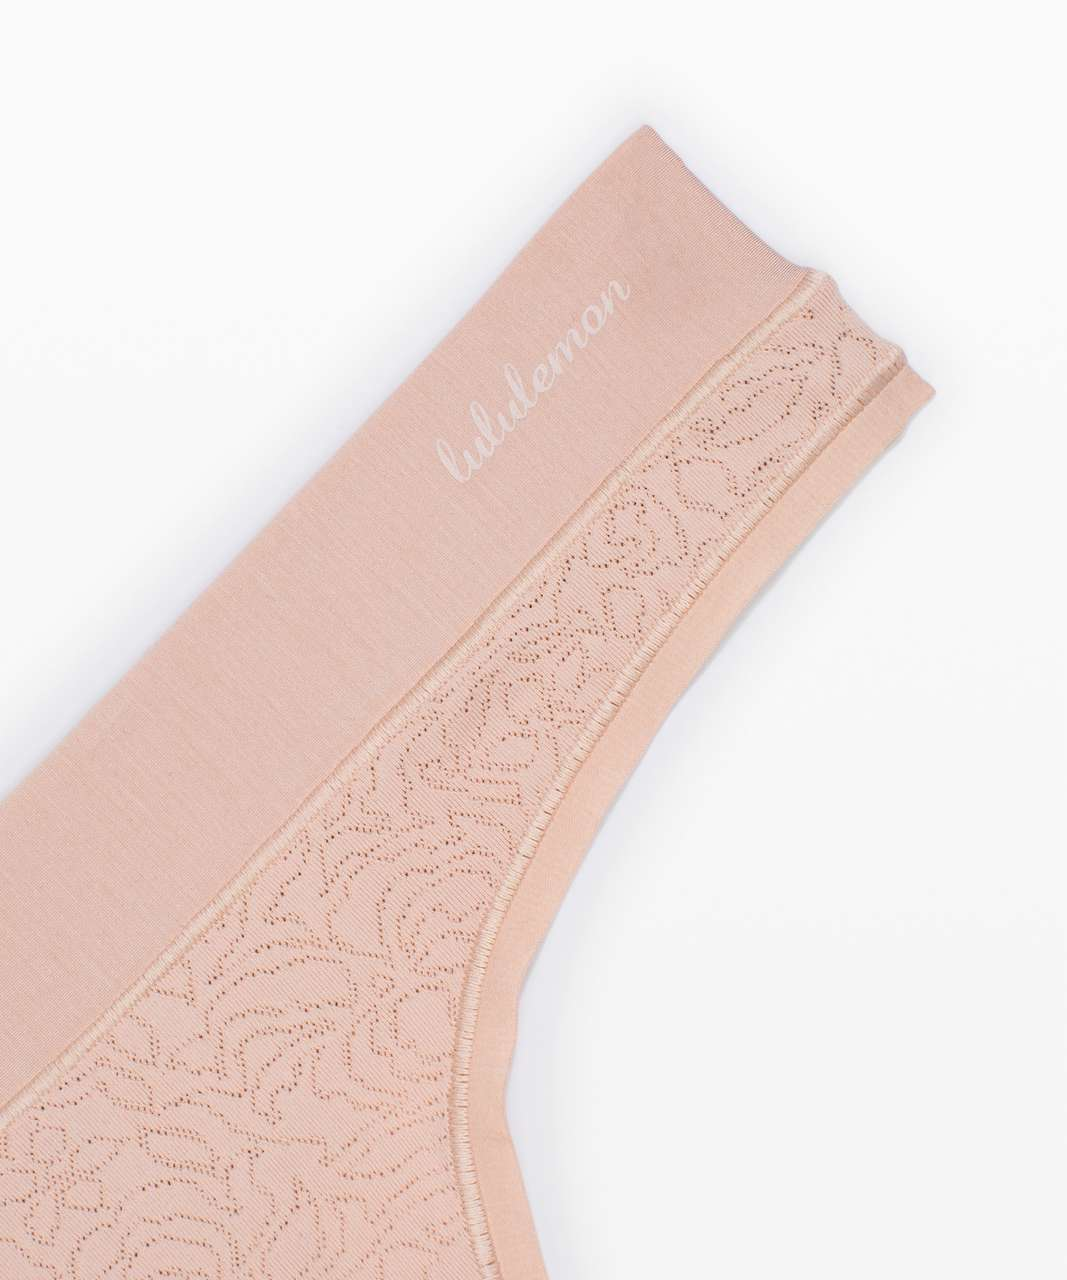 Lululemon Soft Breathable Thong *Lace 3 Pack - Garnet / Misty Shell / Black